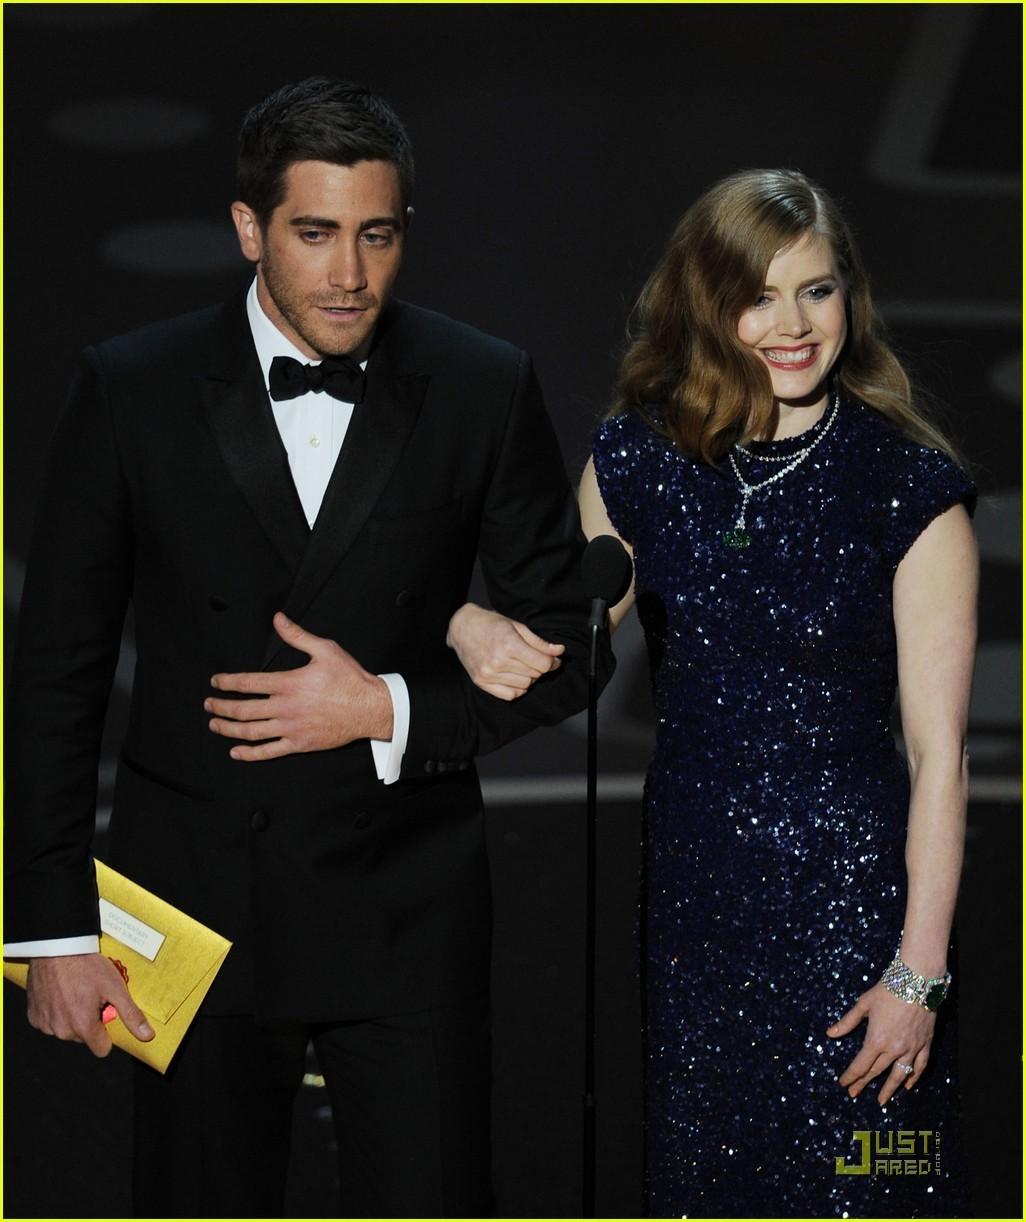 http://4.bp.blogspot.com/-O7t450Fz9CE/UAGSluavVVI/AAAAAAAADO0/EYjnjsHTINc/s1600/Jake-Gyllenhaal-Amy-Adams-Oscars-2011-Presenters-jake-gyllenhaal-19735470-1026-1222.jpg